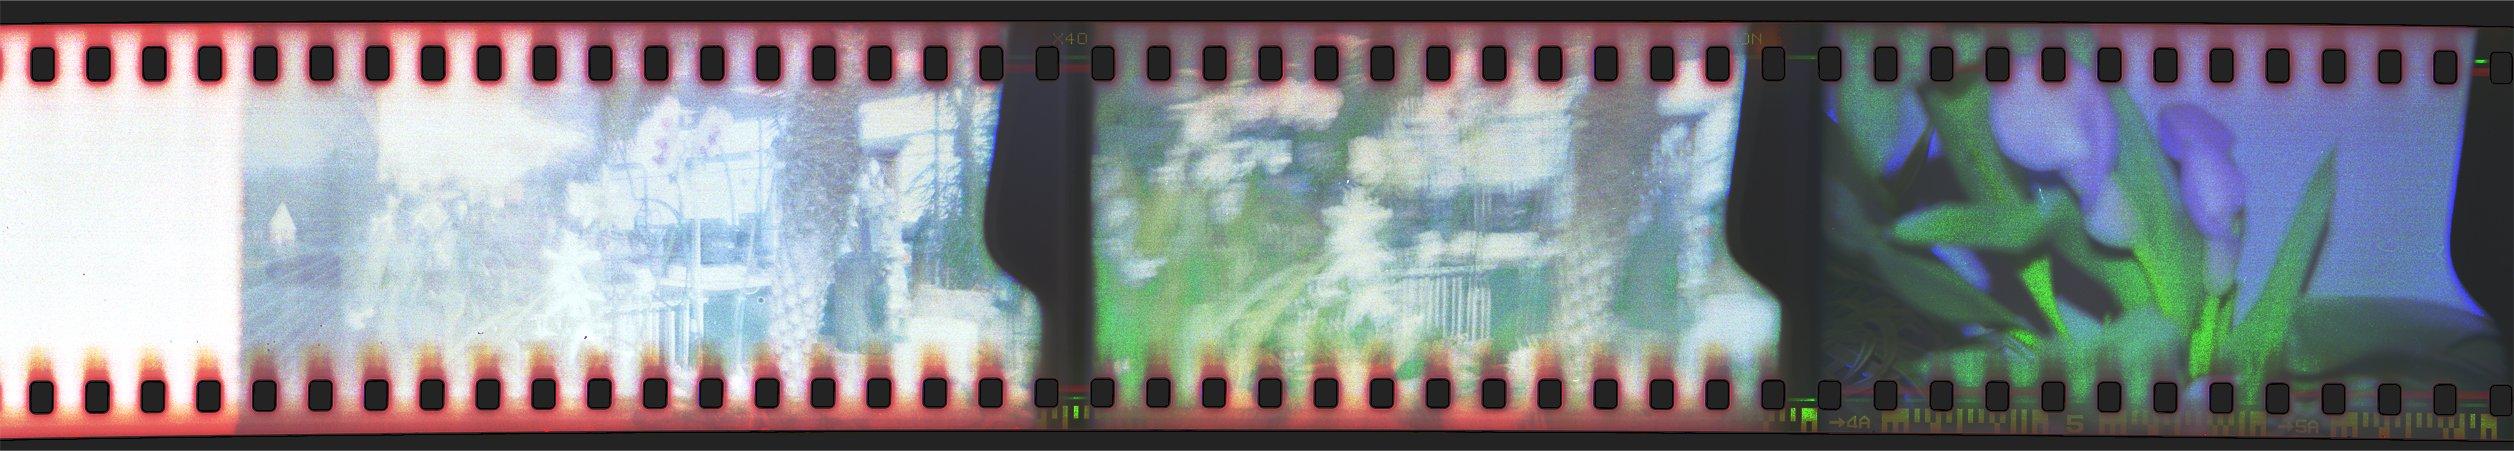 Gardens and Cala Lillies Holga 35mm Sprockets